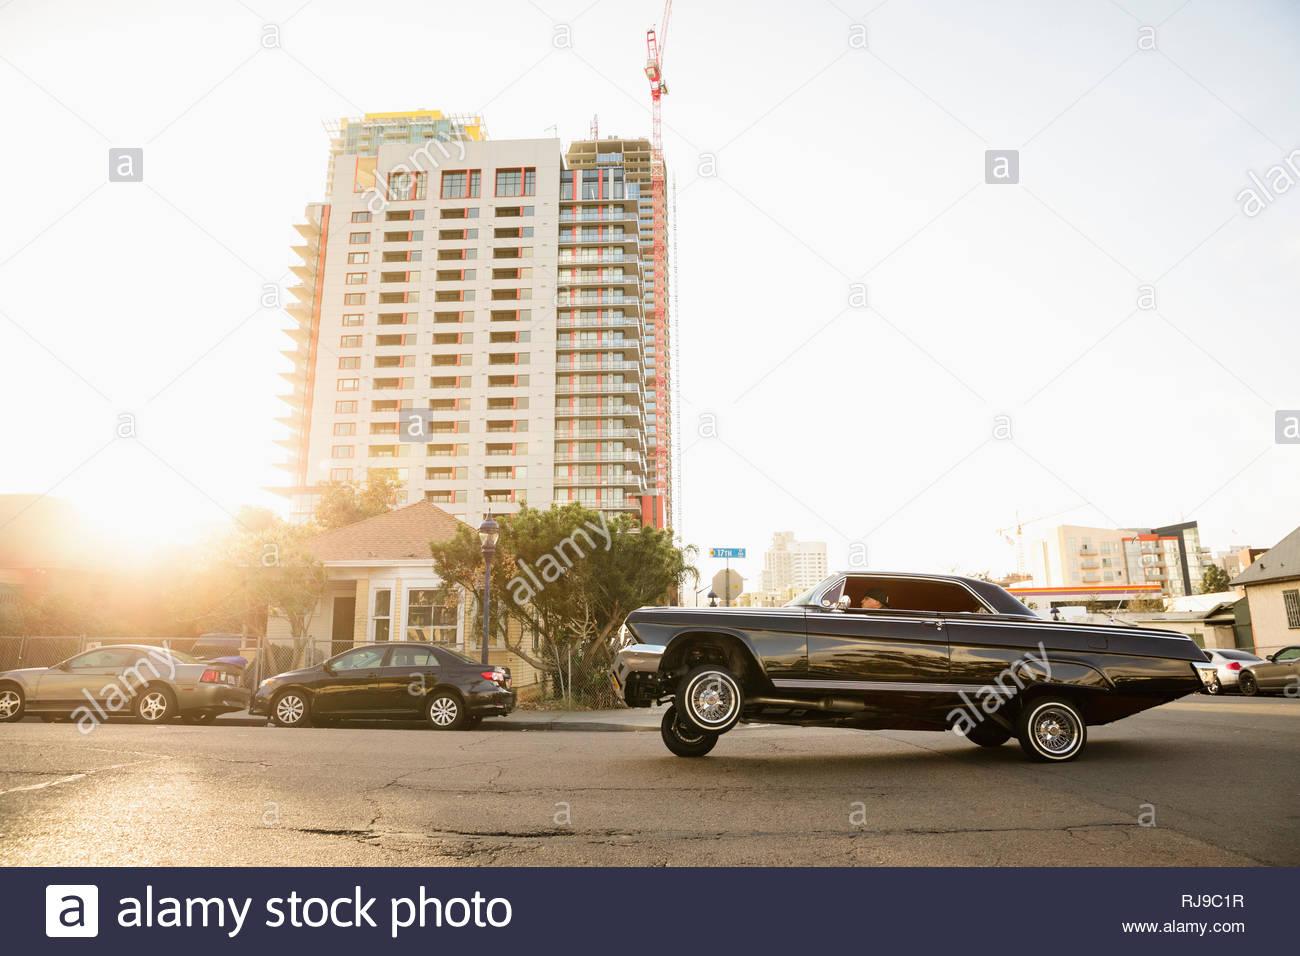 Low rider vintage car bouncing along sunny urban street - Stock Image